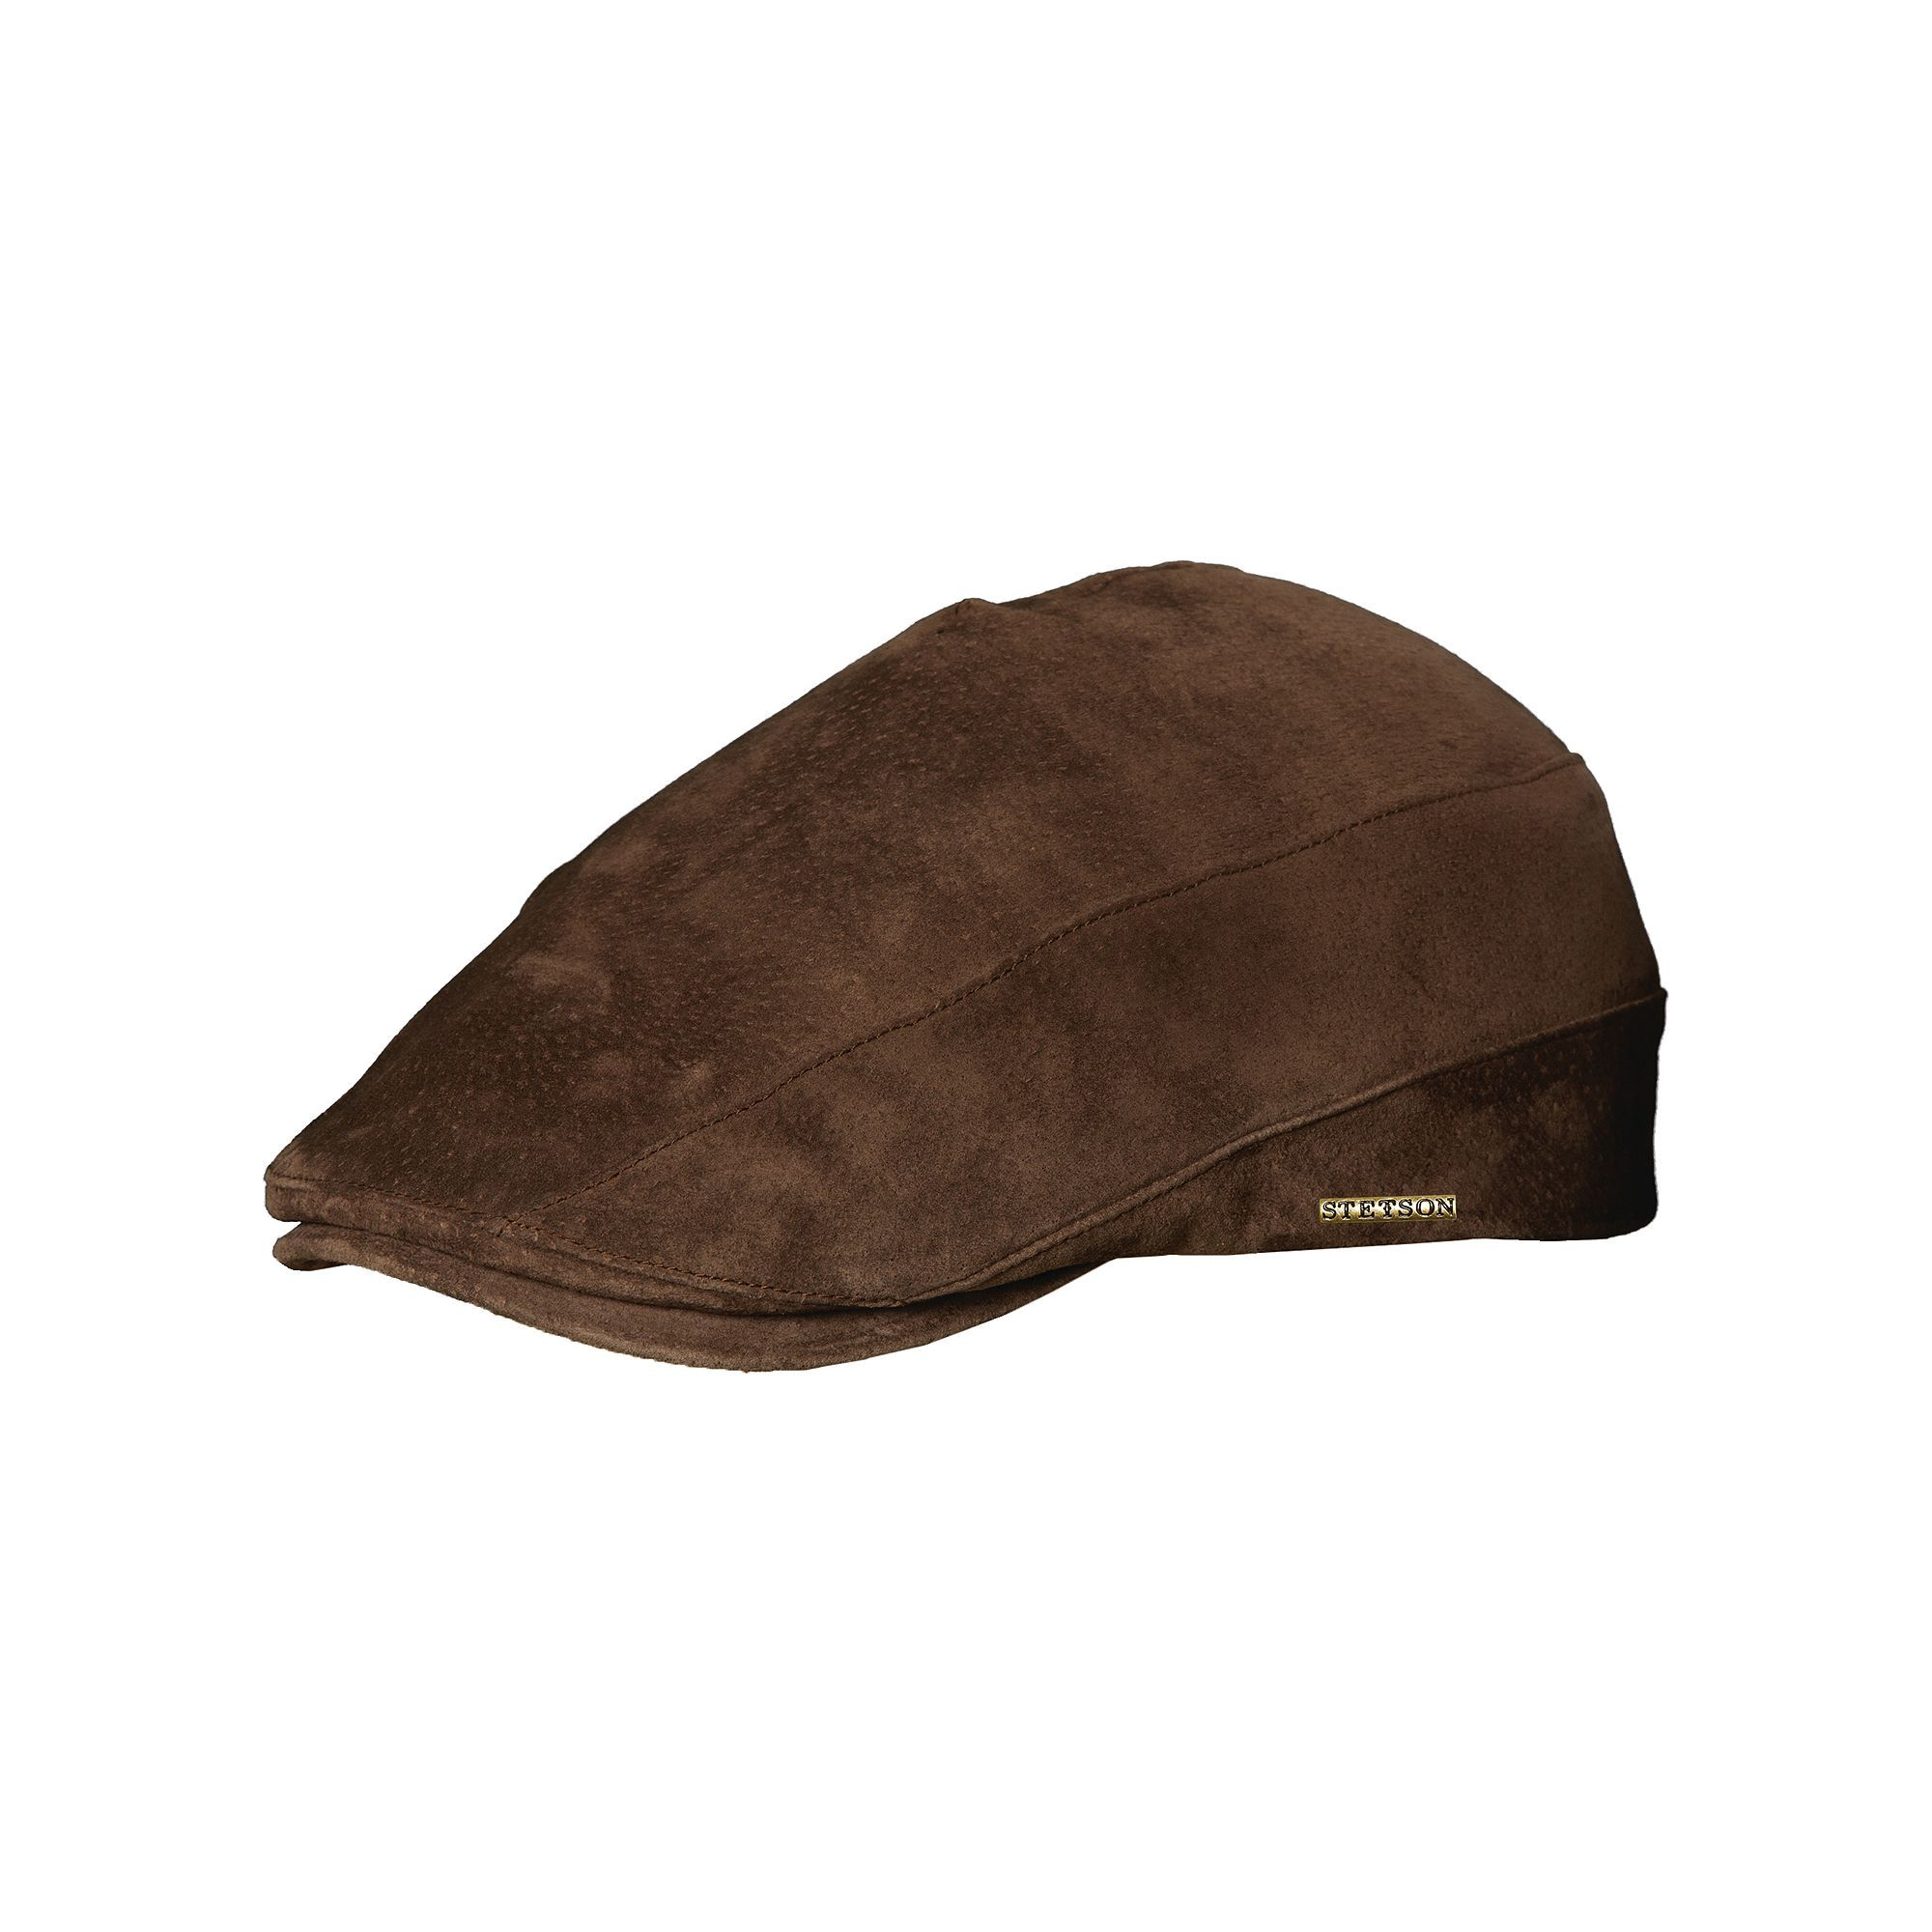 Stetson Suede Ivy Cap Men Ivy Cap Ivy Cap Men Hats For Men